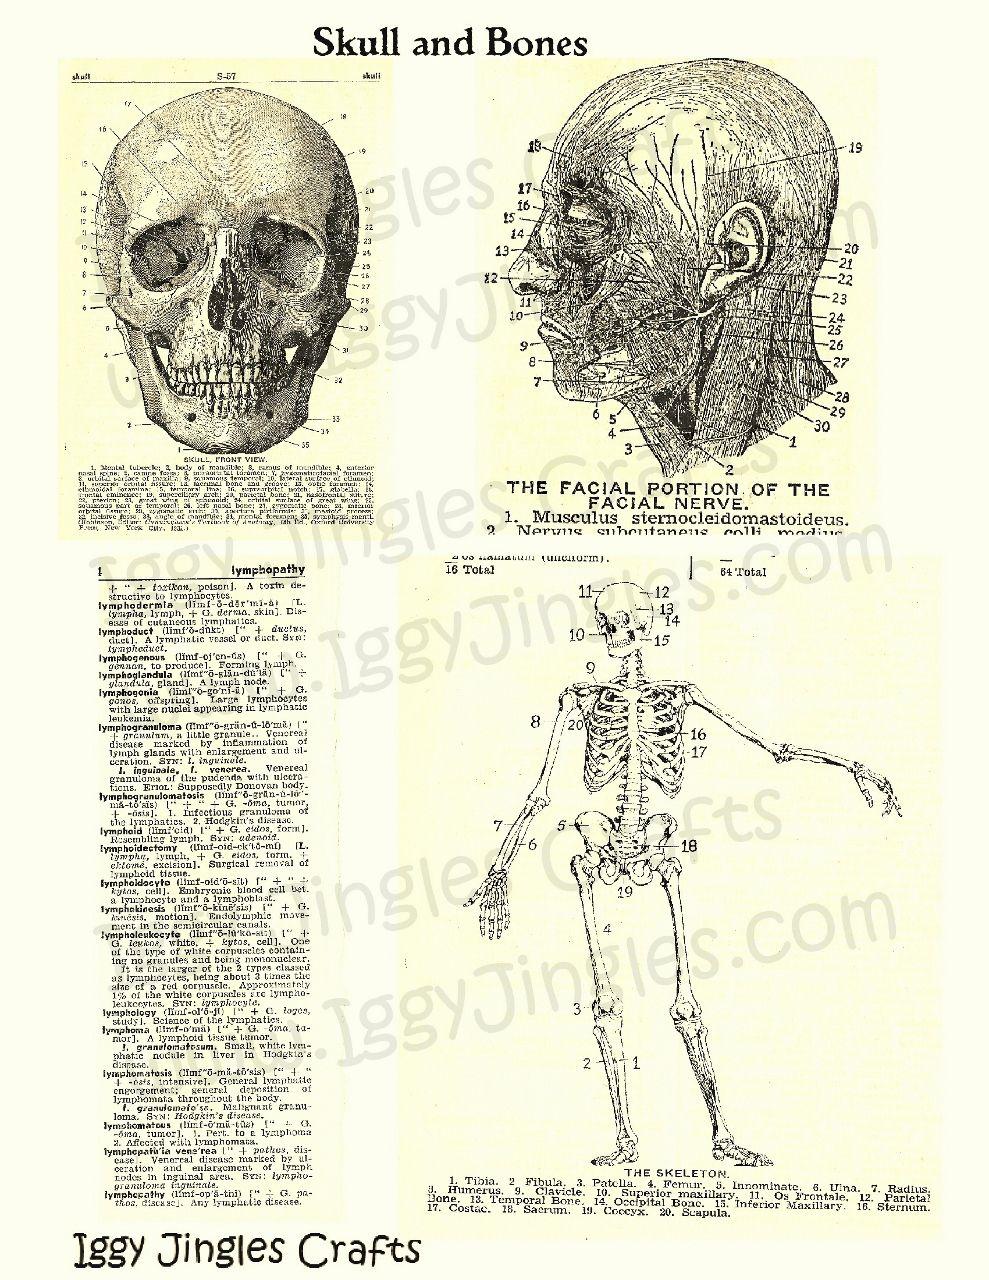 Sepia Skull and Bones Vintage Image Collage Sheet